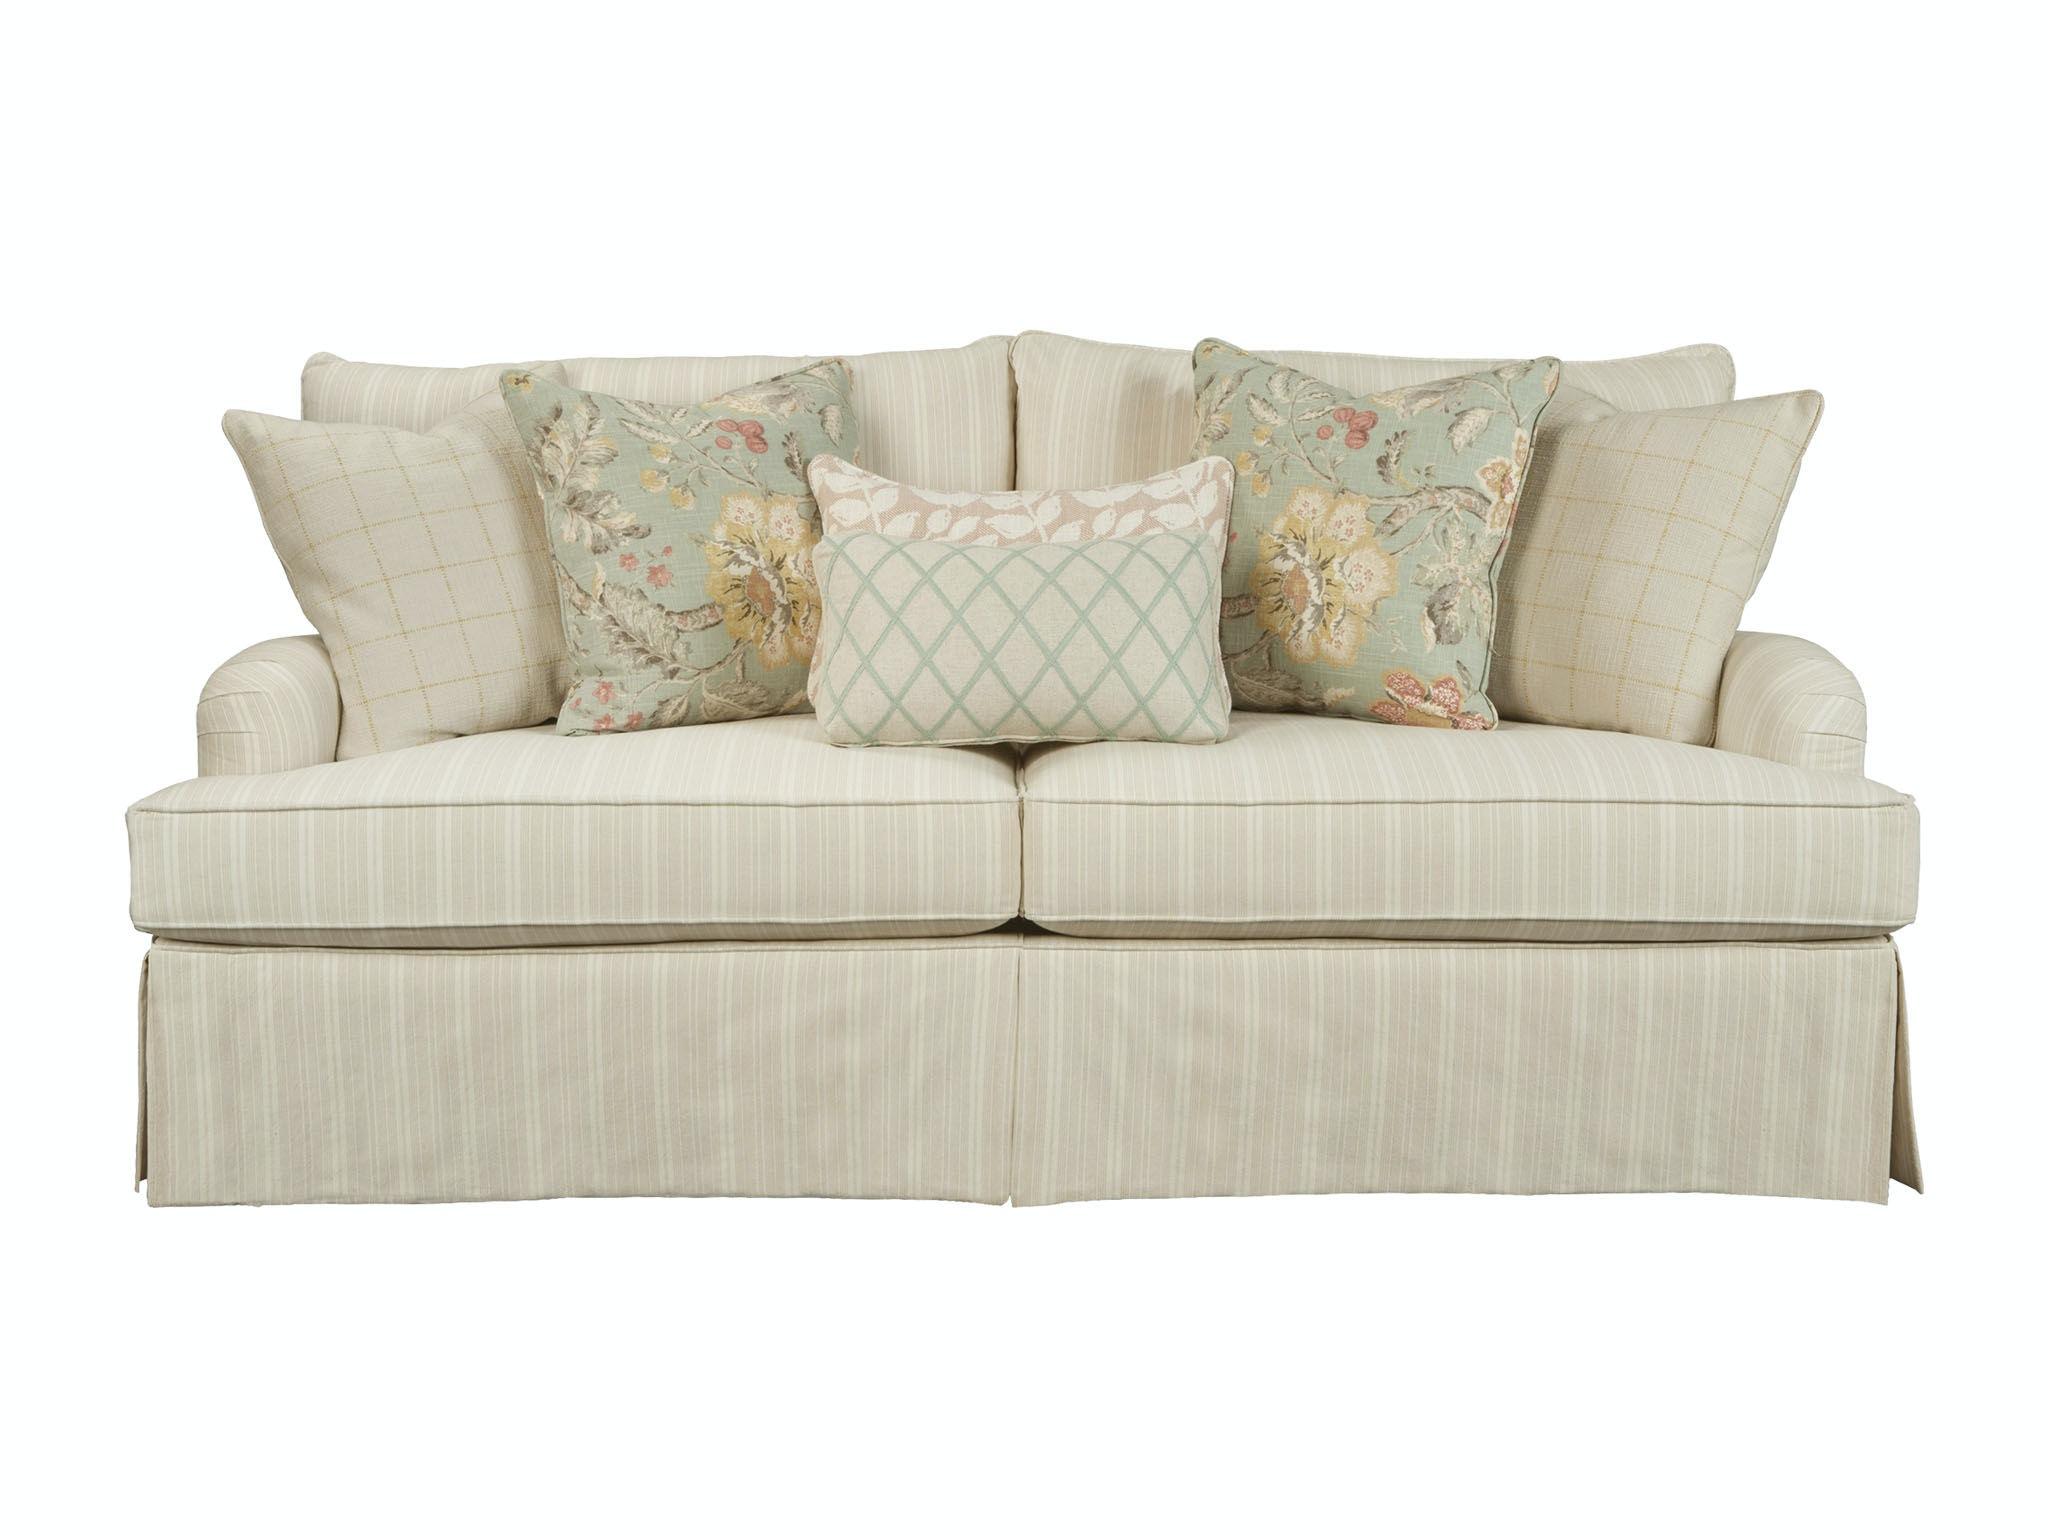 craftmaster living room furniture llama in my remix paula deen by sofa p973650bd gorman s at